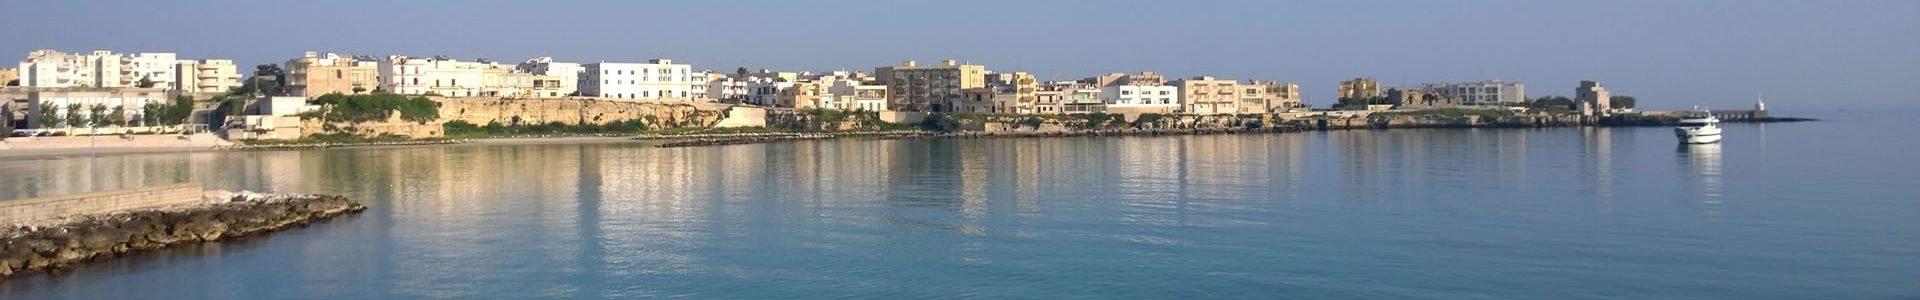 Casa Vacanze 6 ad Otranto